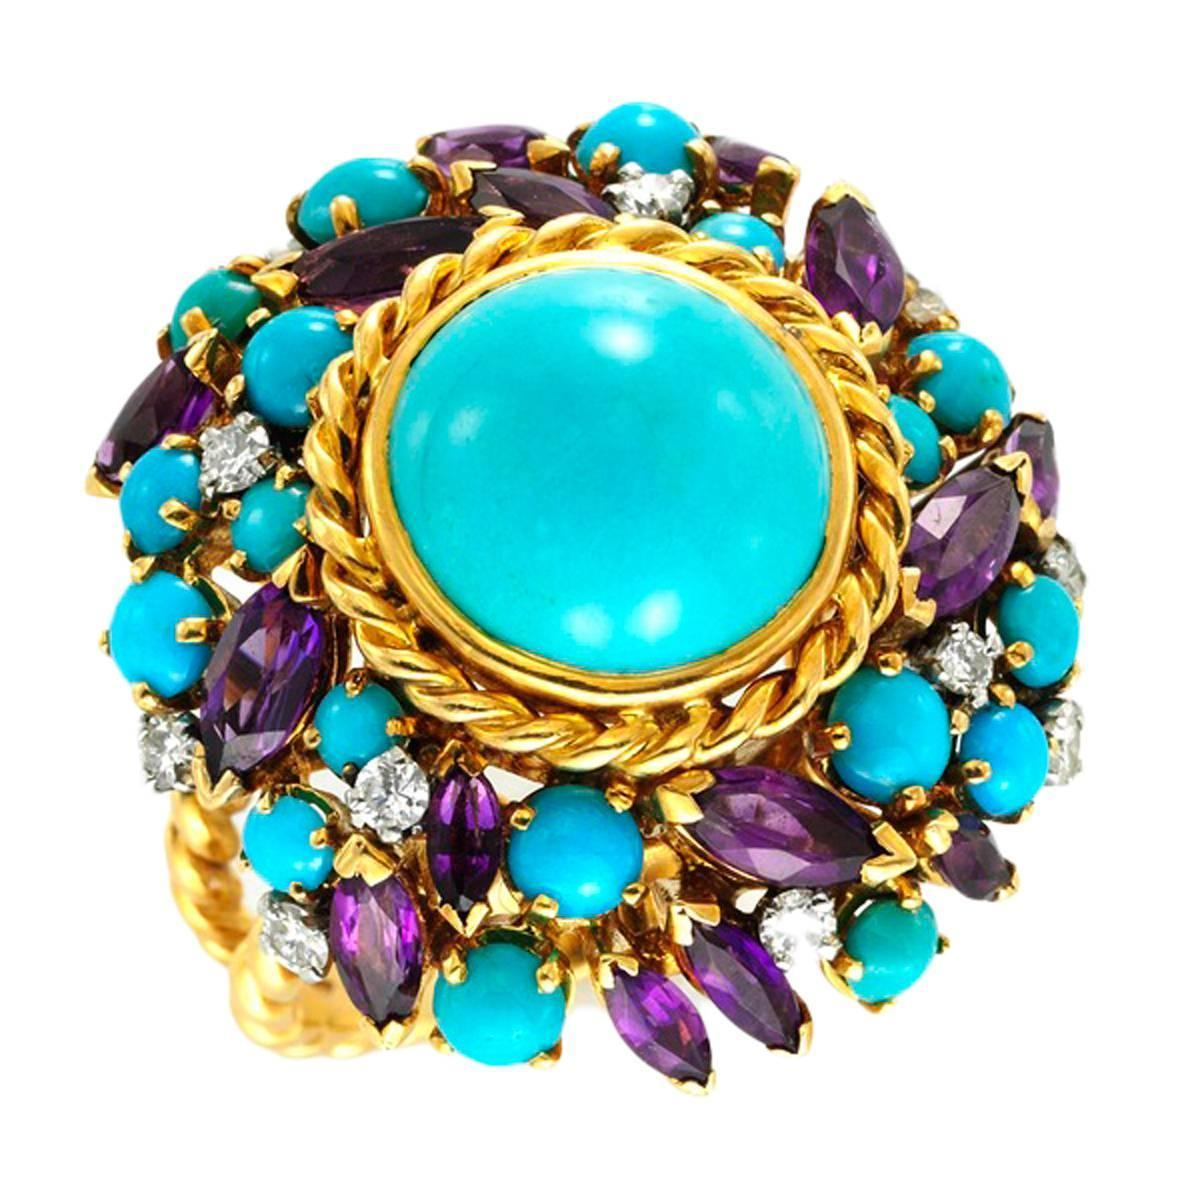 Fiona Druckenmiller's Exquisite Manhattan Jewel Shop